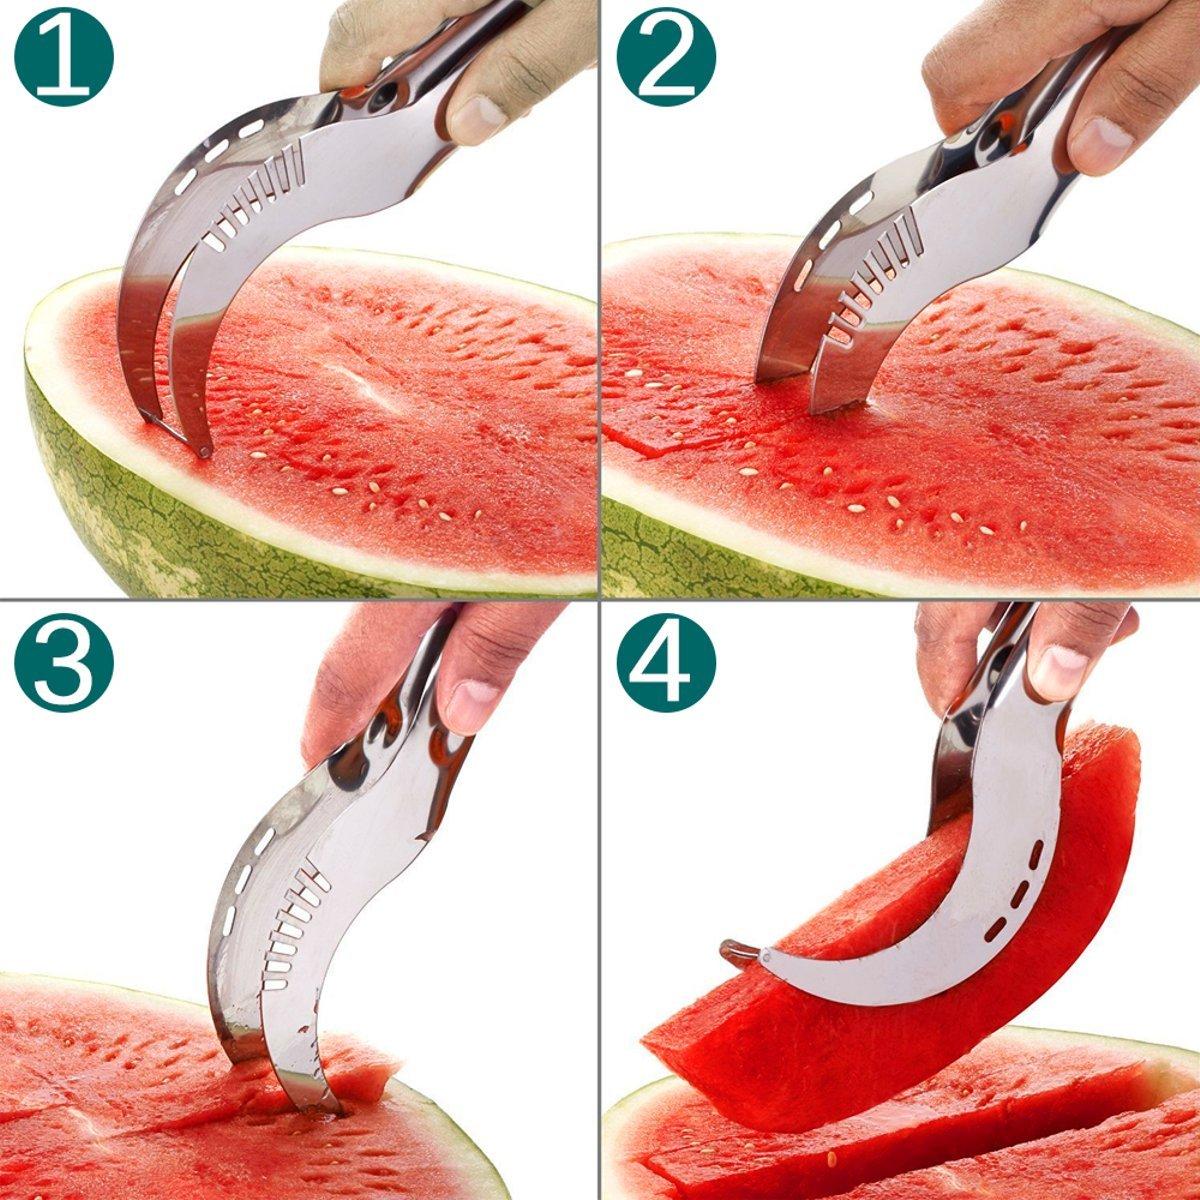 Tacoli- 20.82.62.8CM Stainless Steel Watermelon Slicer Cutter Knife Corer Fruit Vegetable Tools Kitchen Gadgets